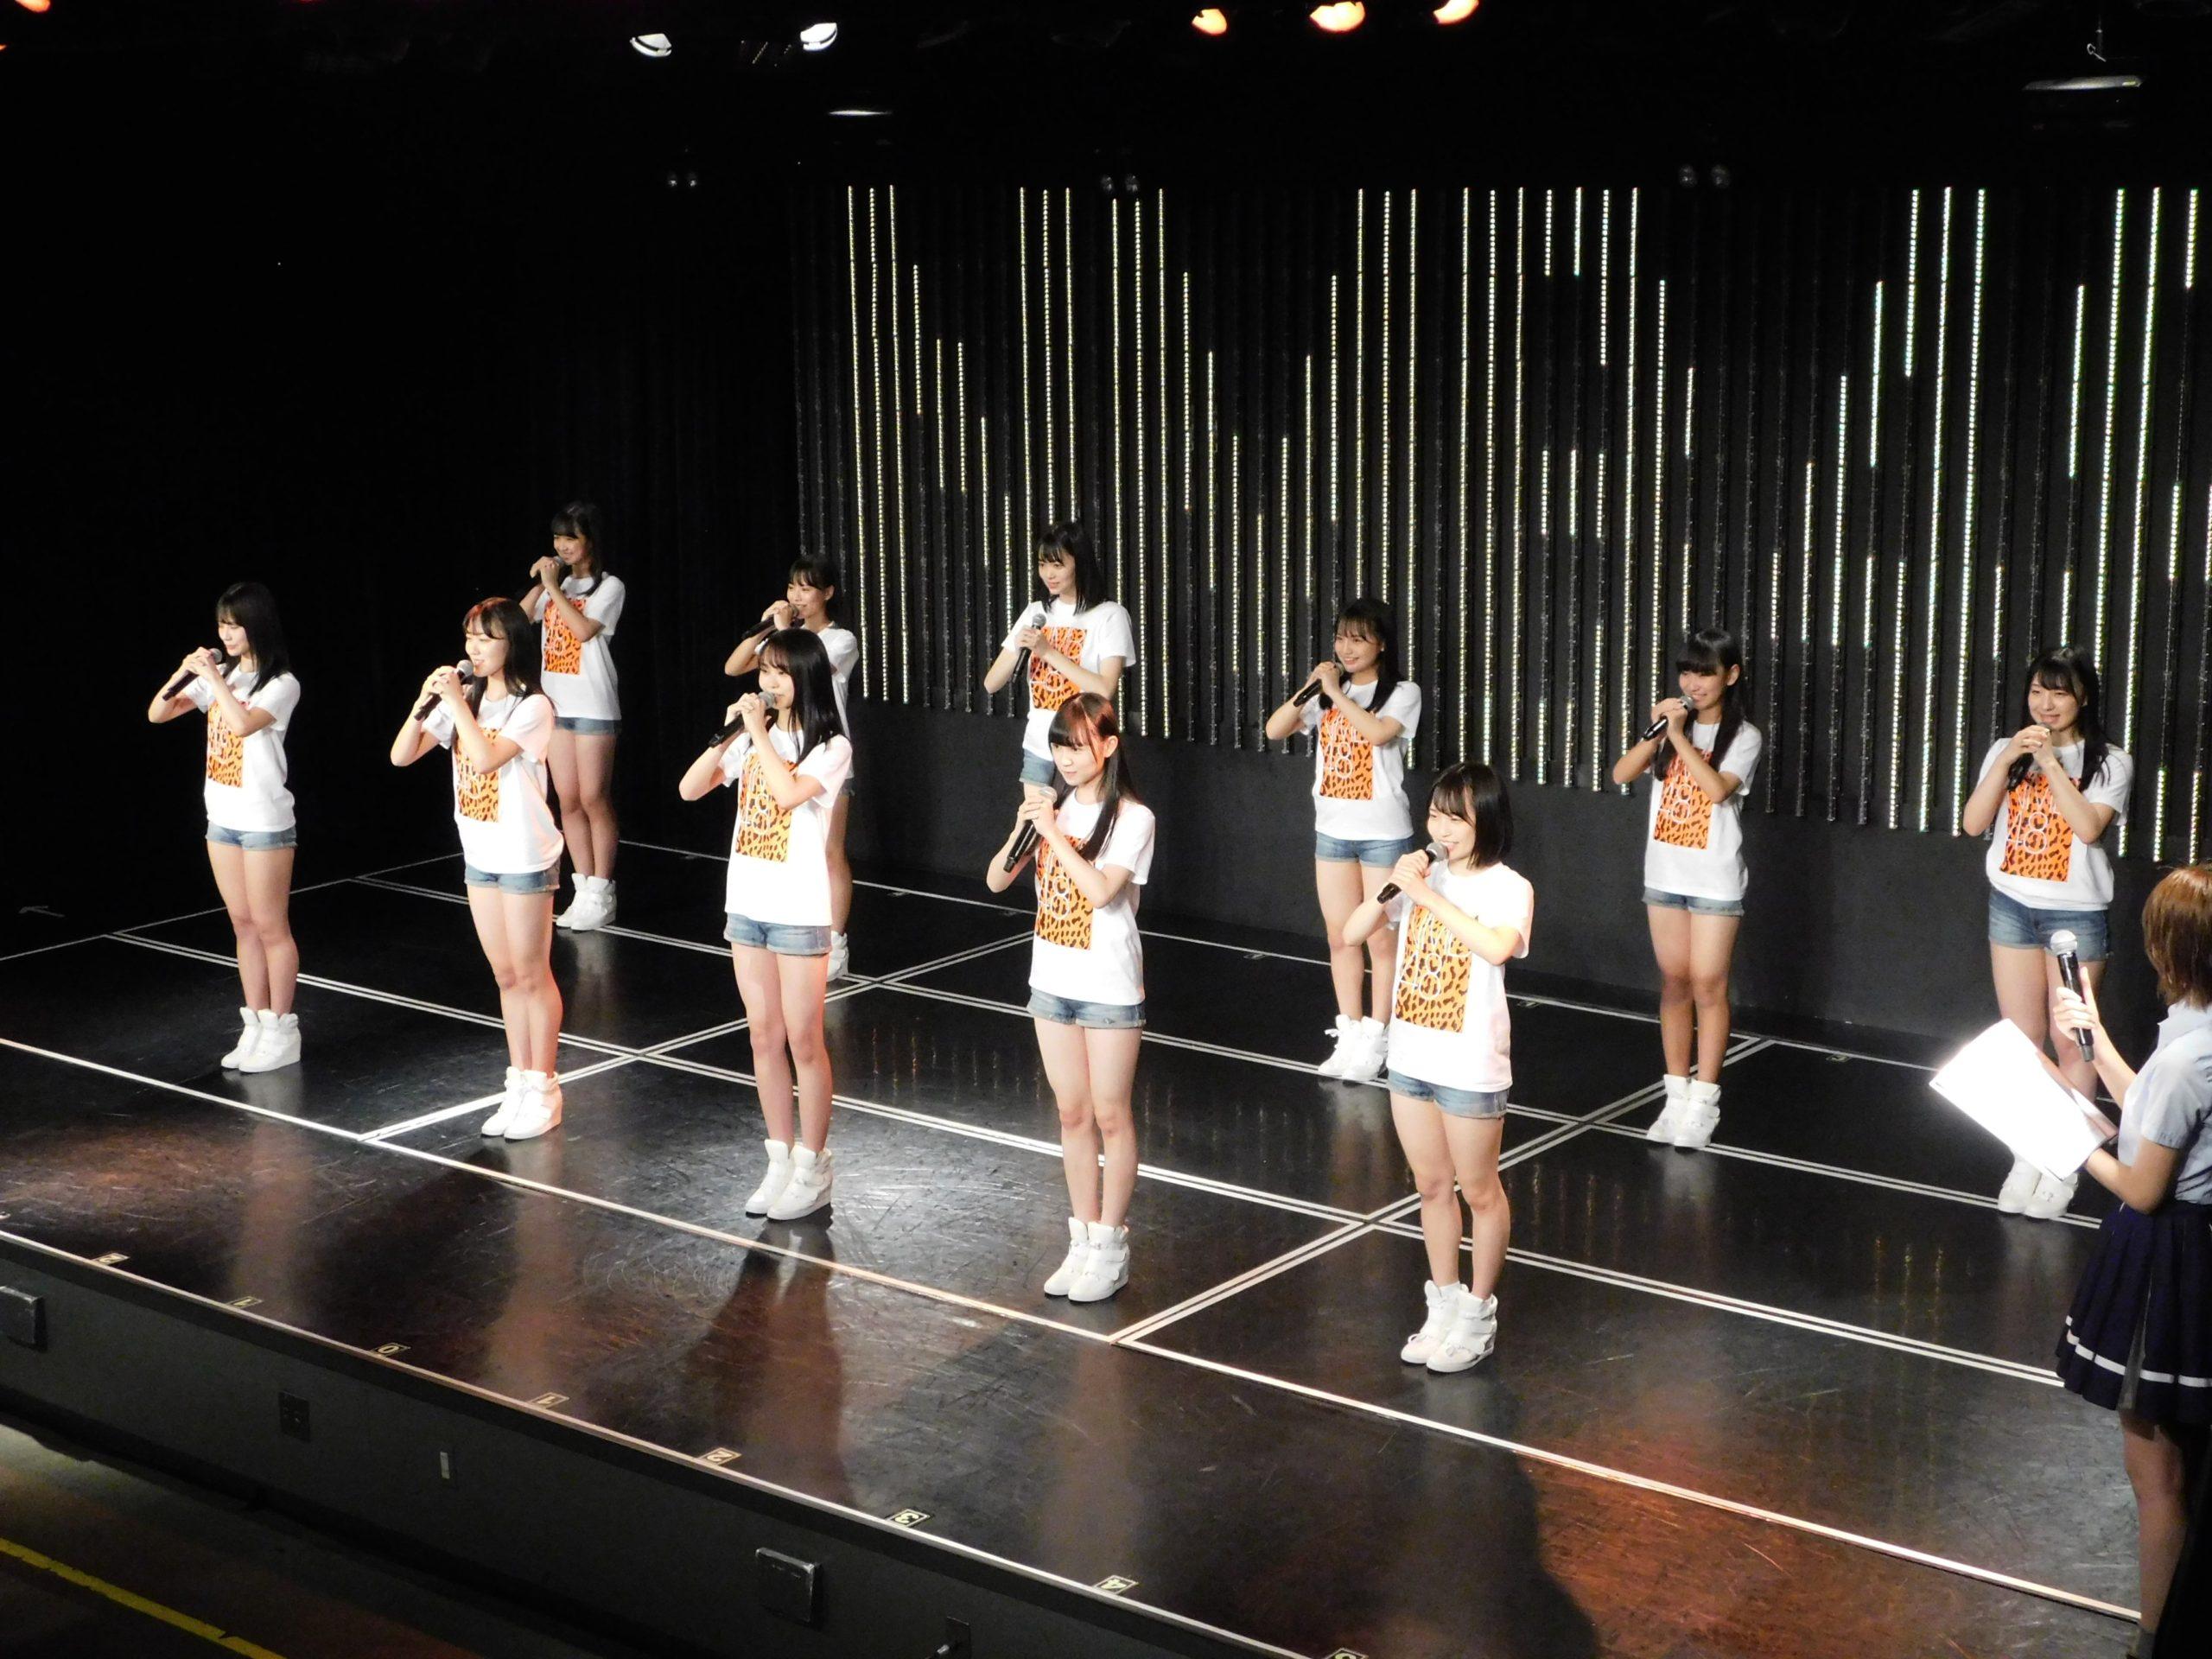 【NMB48】7期生キャッチフレーズ動画集